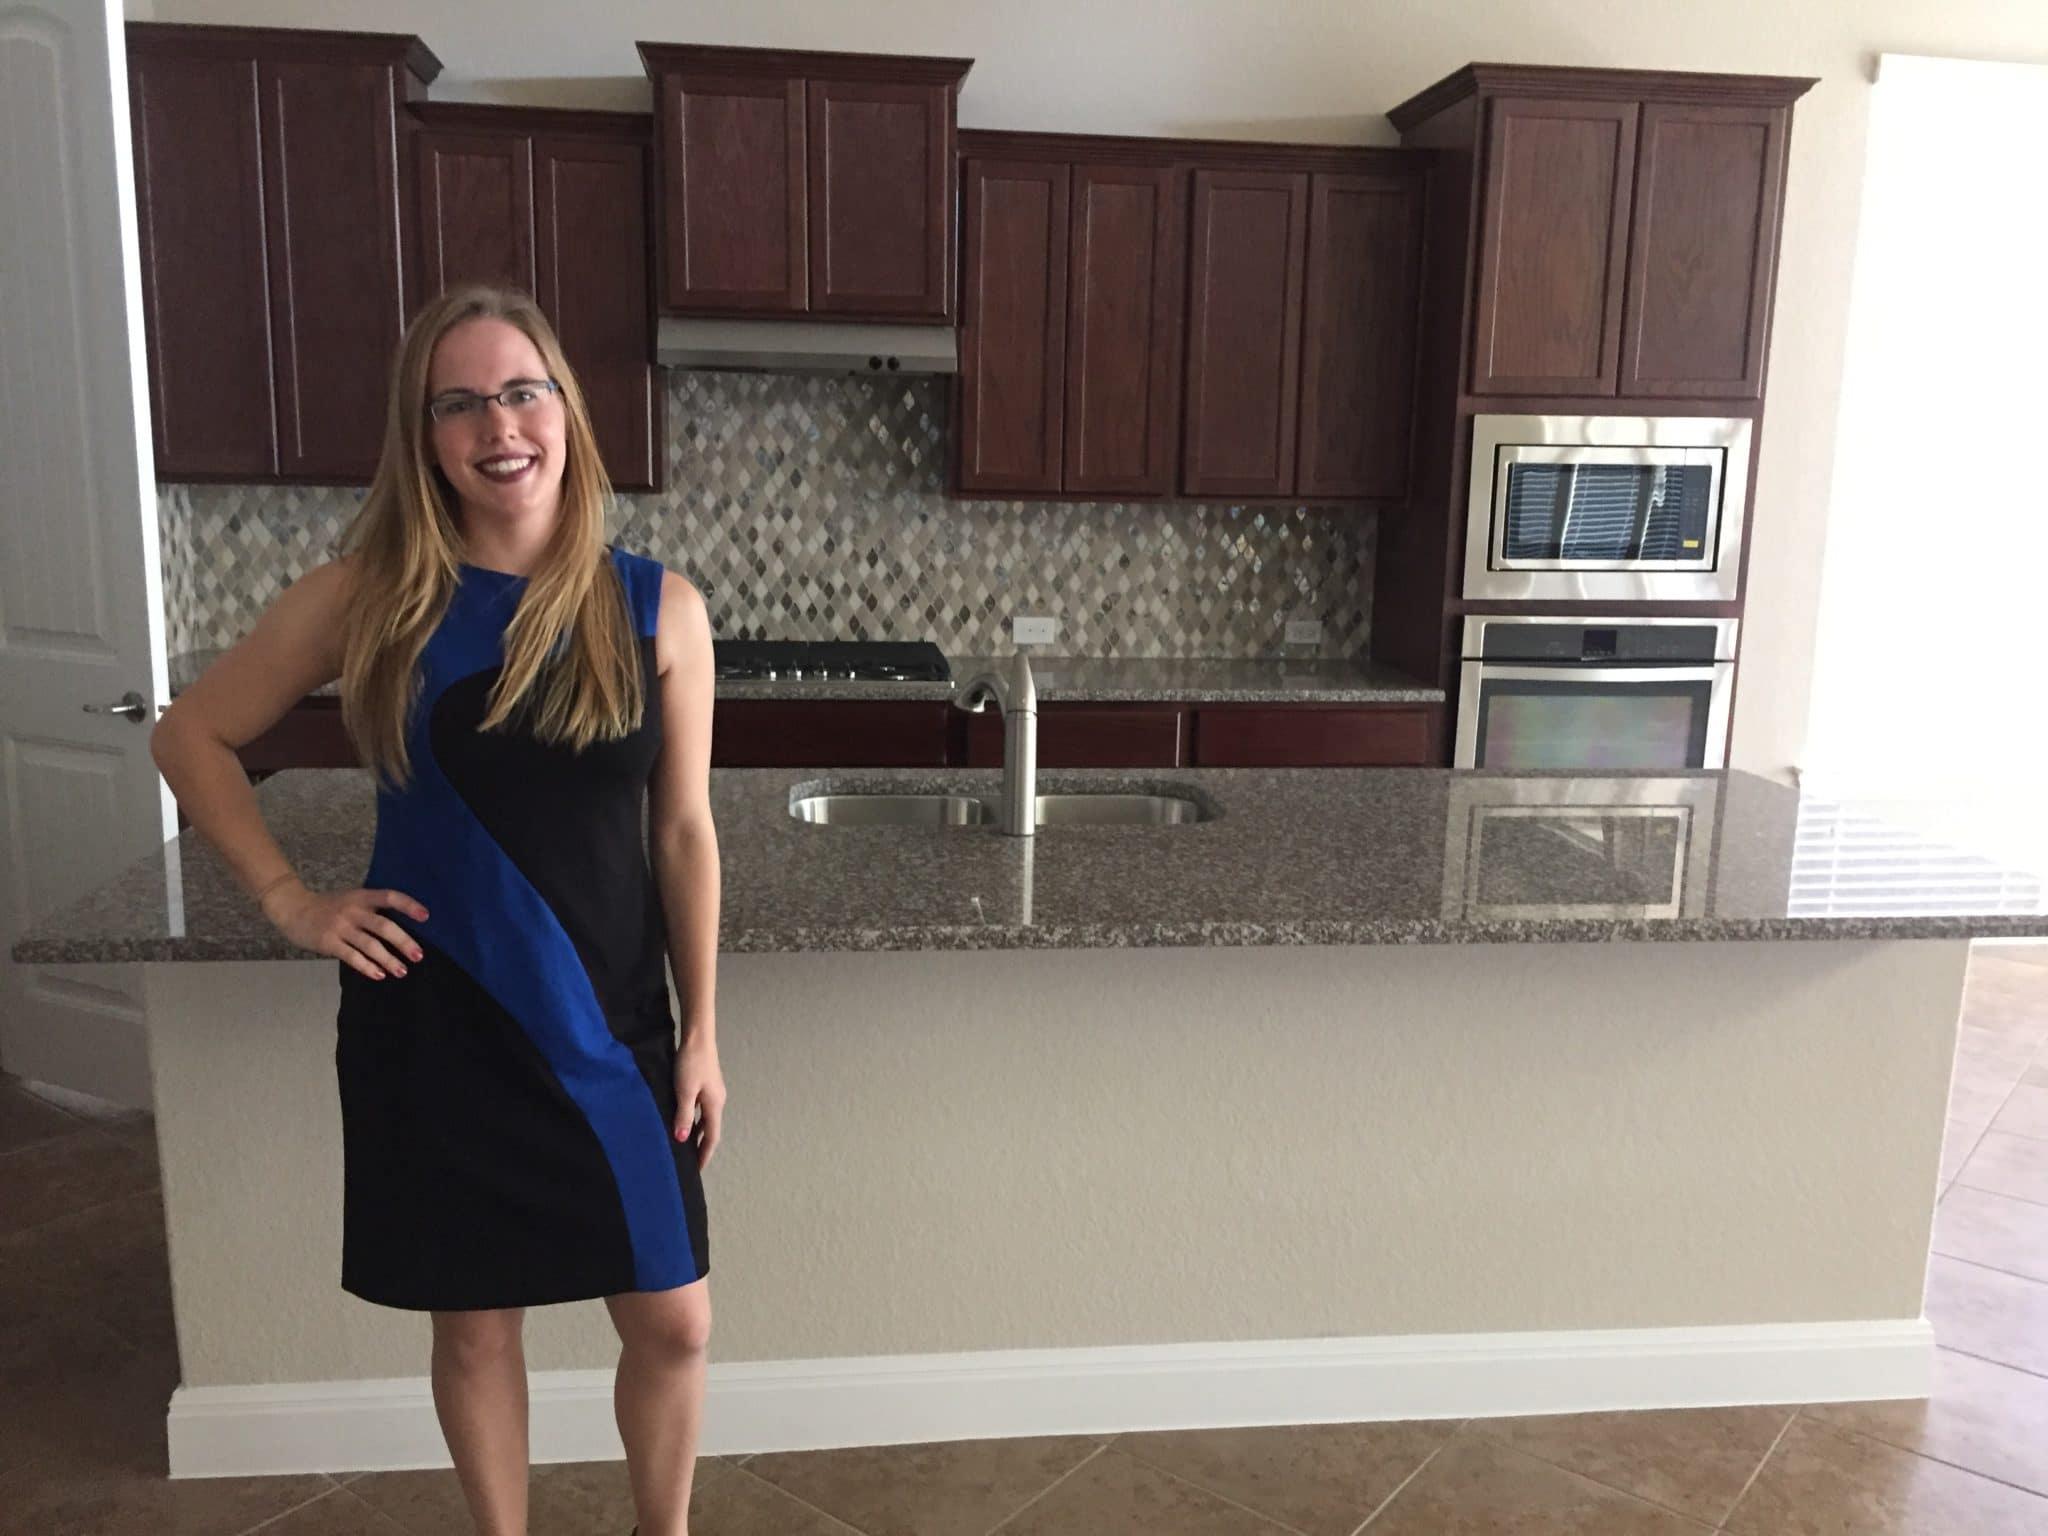 Amanda Mesina - Associate Executive Director of Austin, Texas